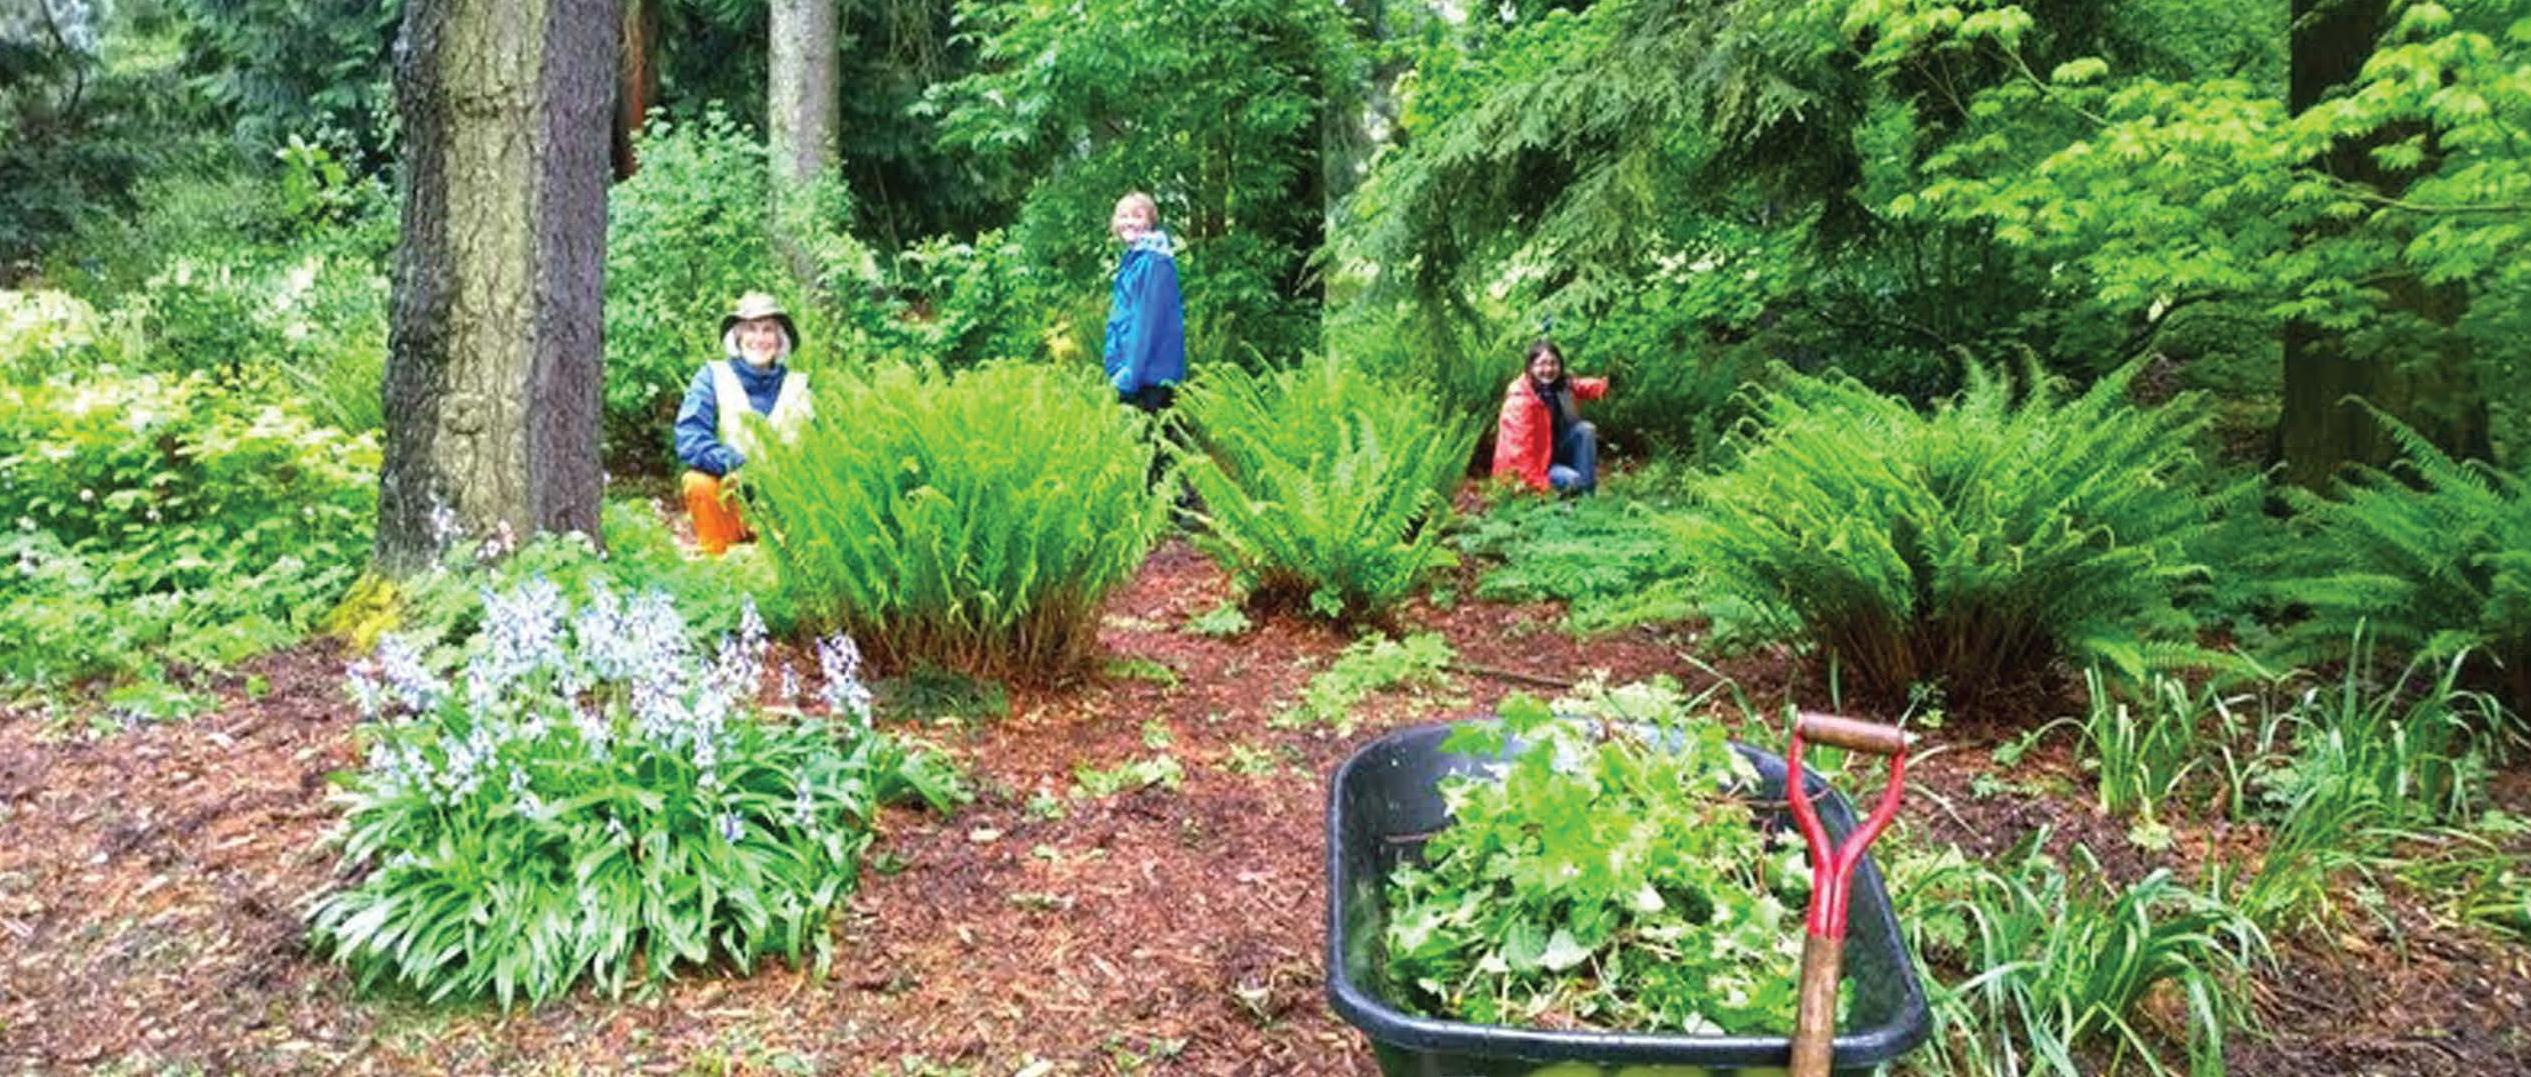 Spring Restoration Day Volunteers Gardening